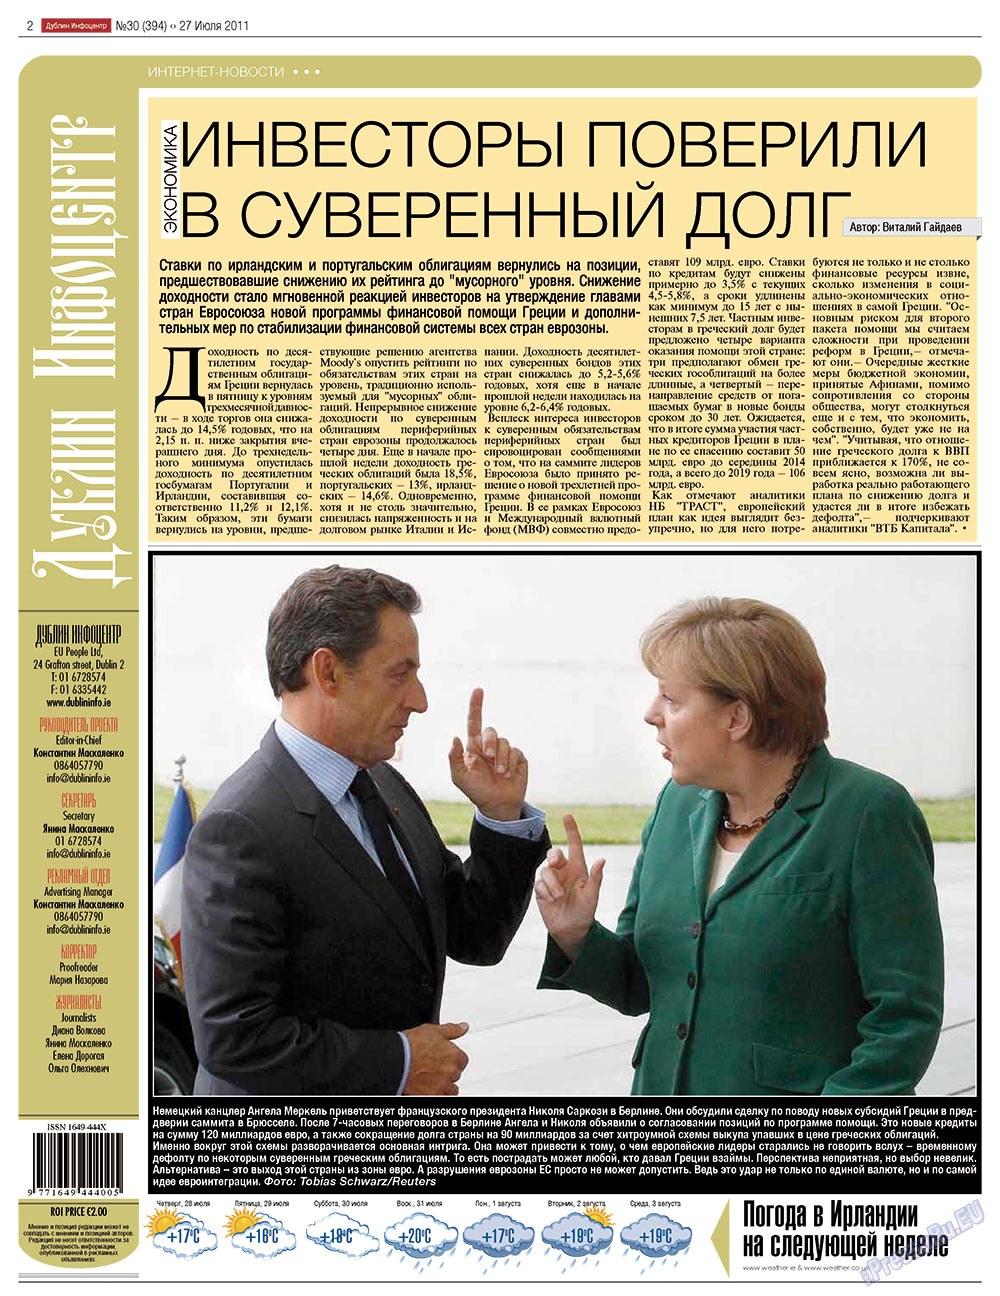 Дублин инфоцентр (газета). 2011 год, номер 30, стр. 2